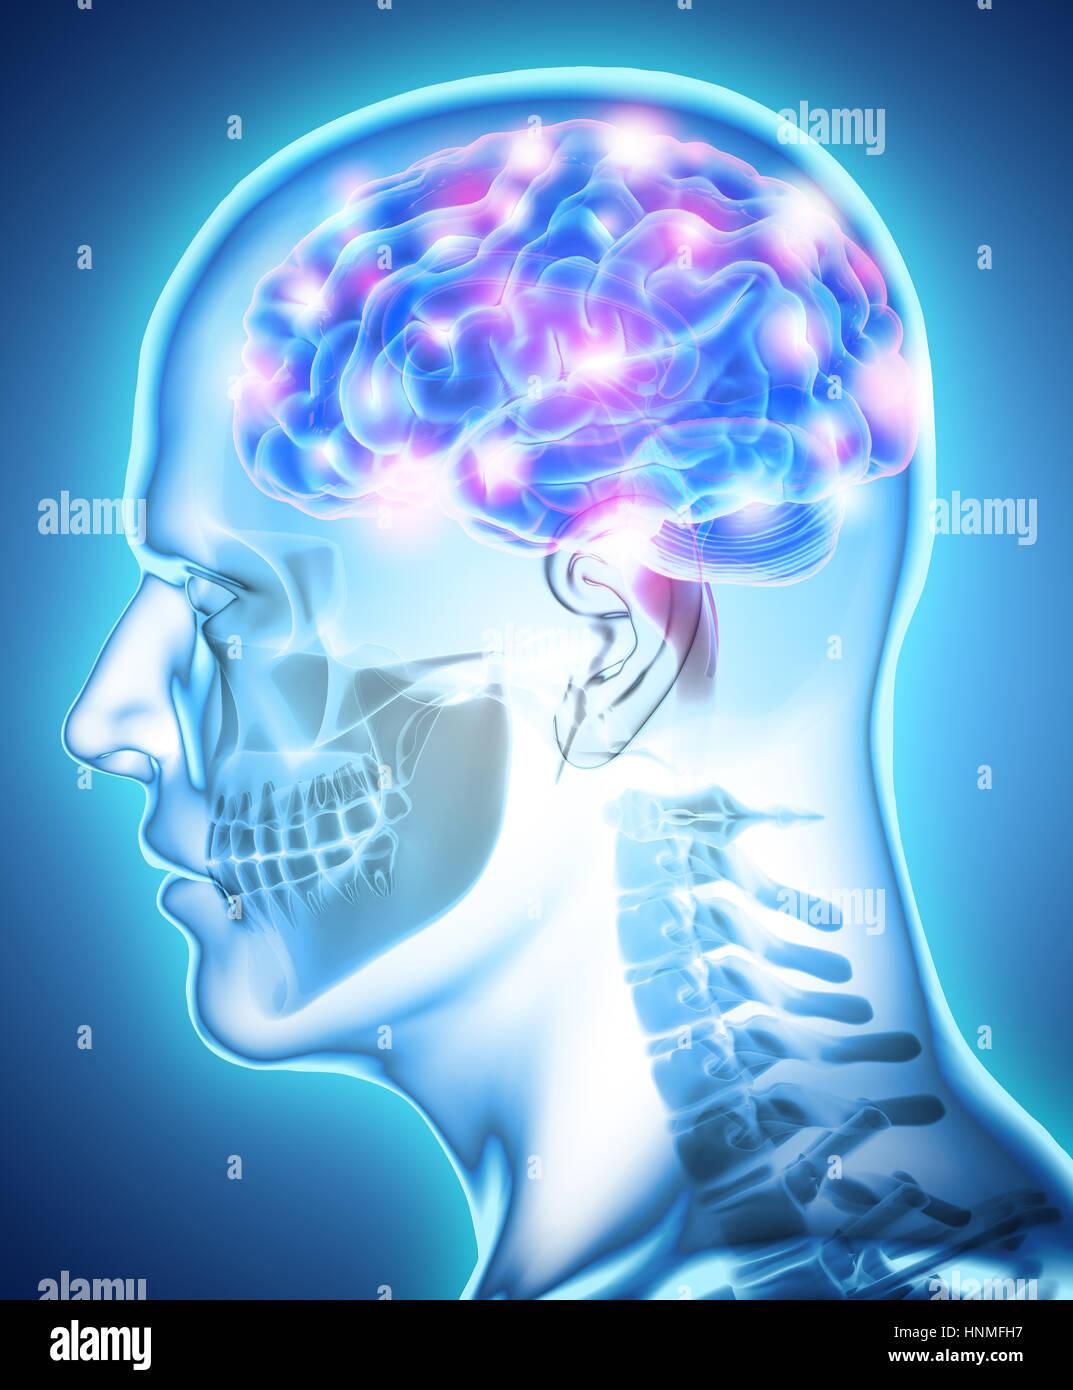 Human Internal Organic - Human Brain, 3D illustration medical concept. - Stock Image